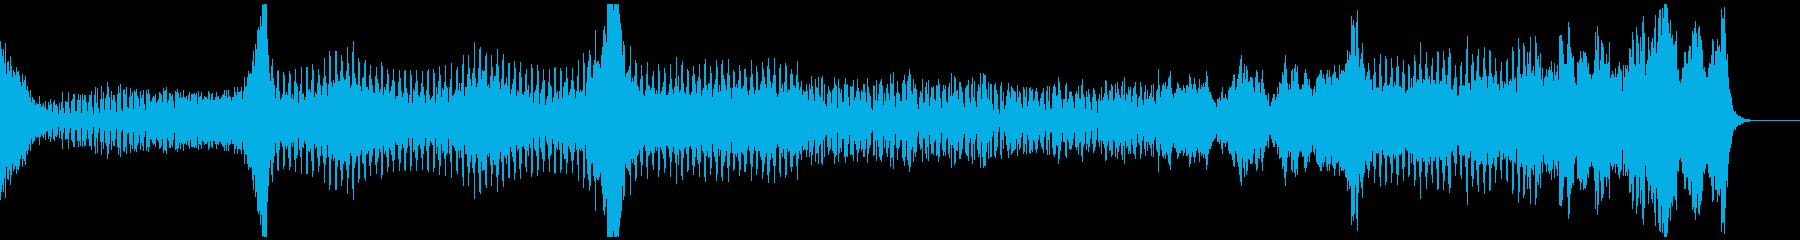 SF系、緊迫、緊張感のあるテクノ+オケの再生済みの波形